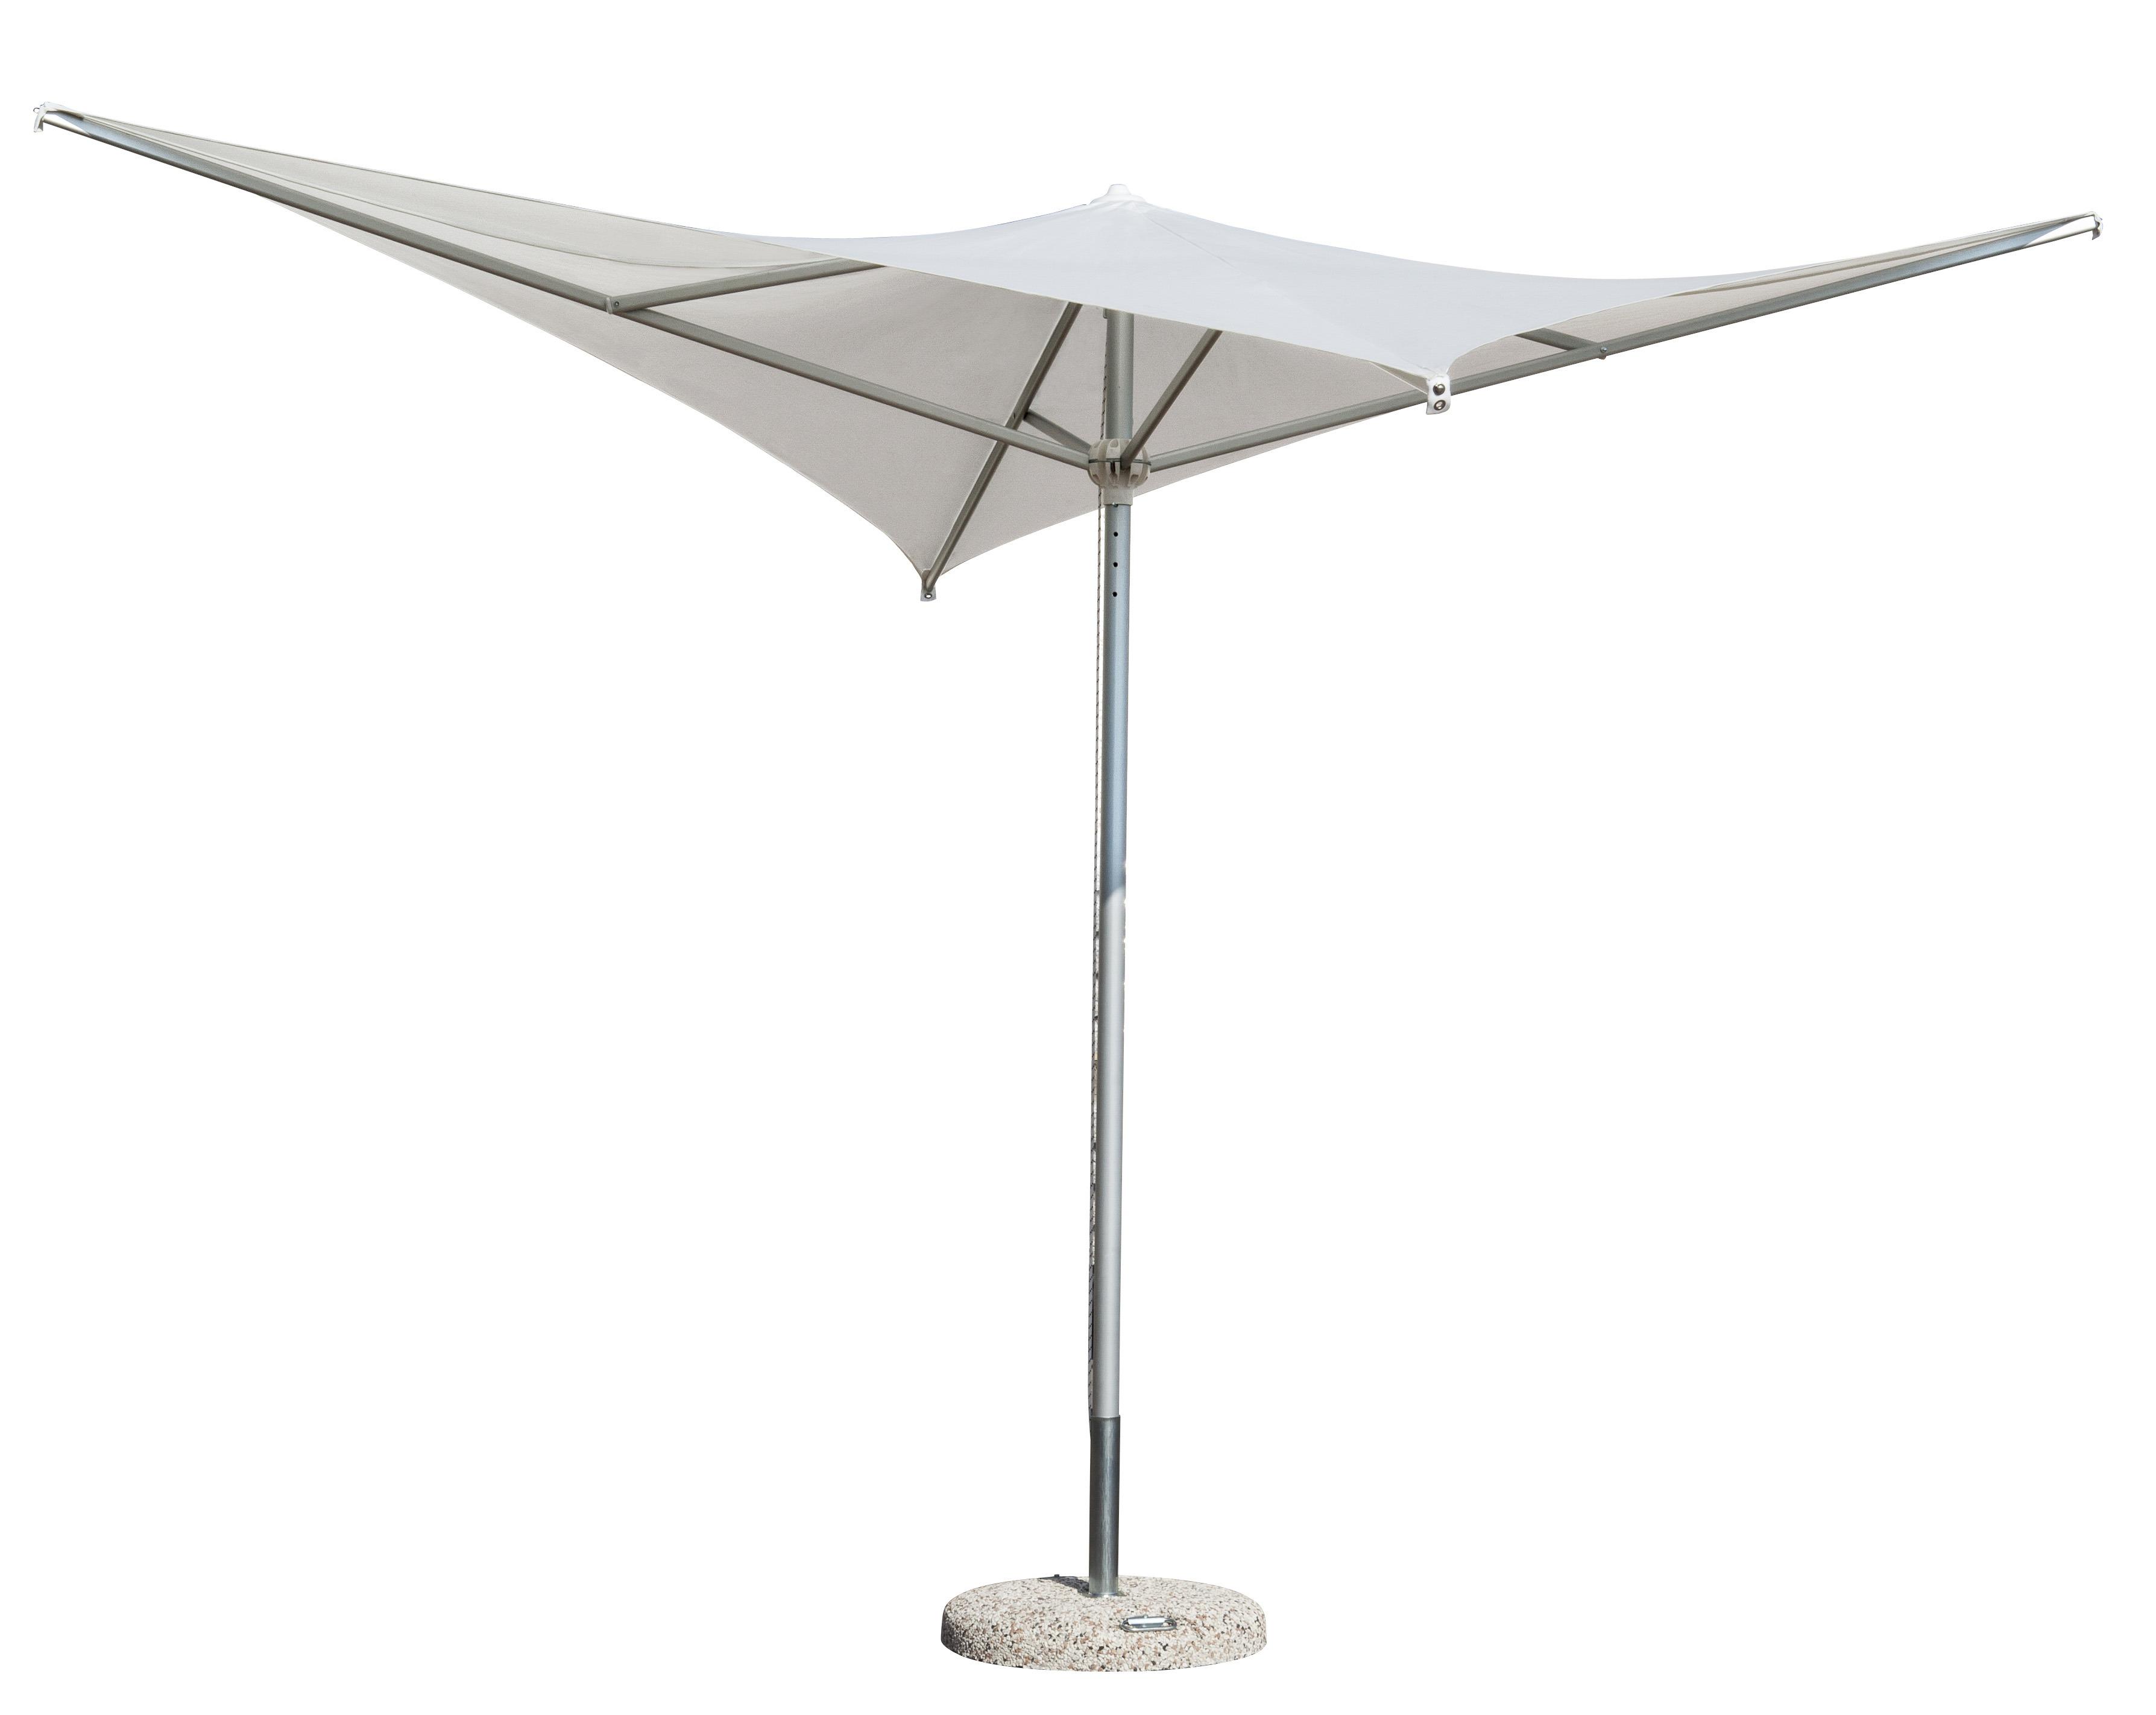 design umbrellas design parasols outdoor covers. Black Bedroom Furniture Sets. Home Design Ideas